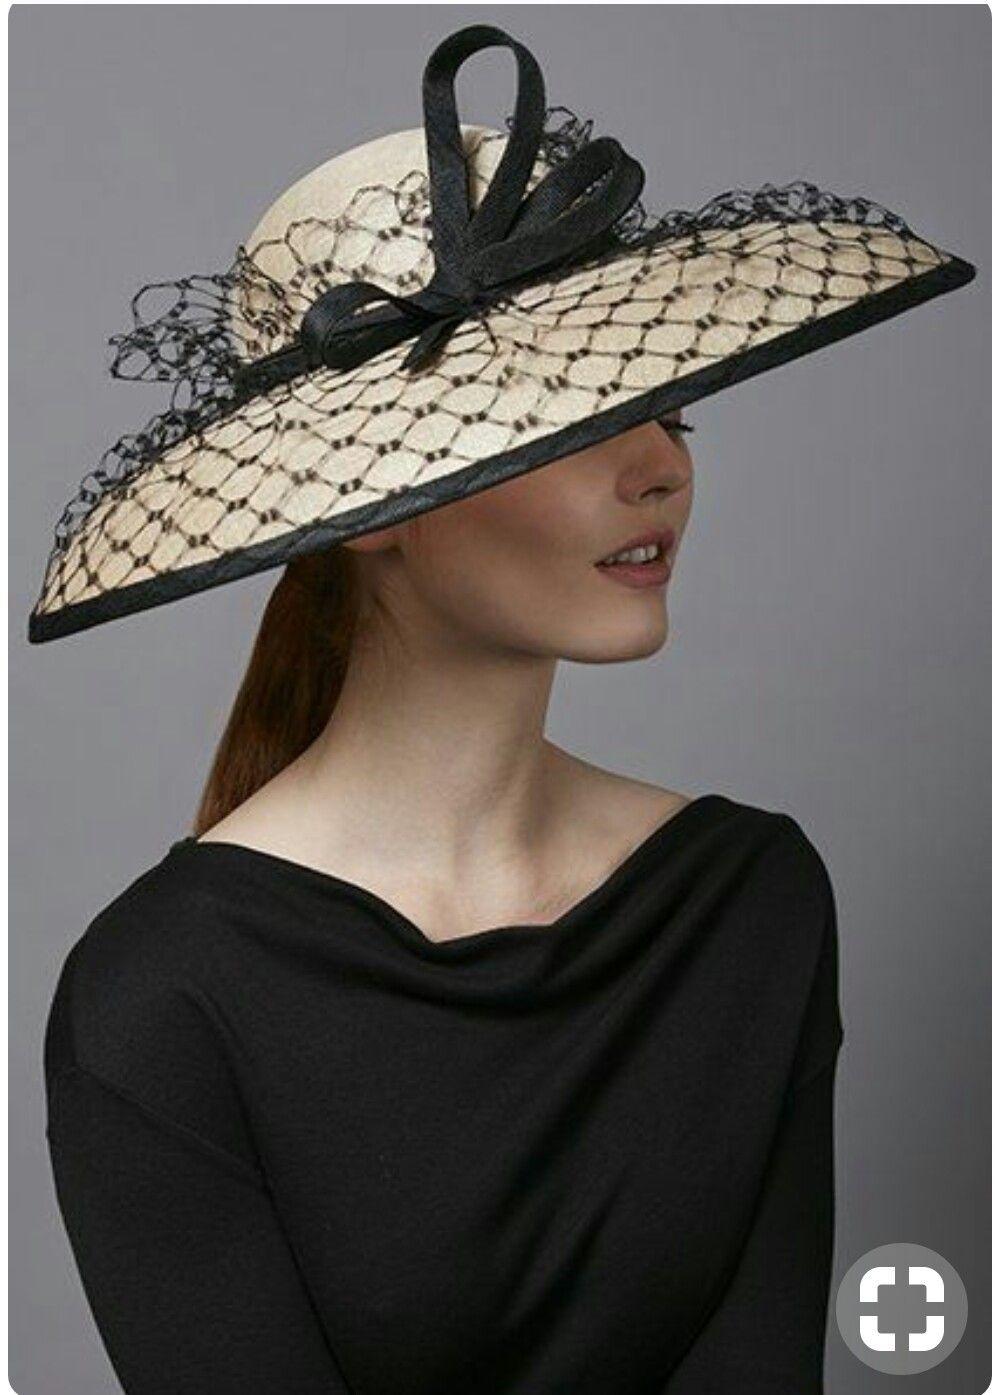 Pin By Fatima Zuniga On Ladies Hat S Wedding Hats Elegant Hats Couture Hats